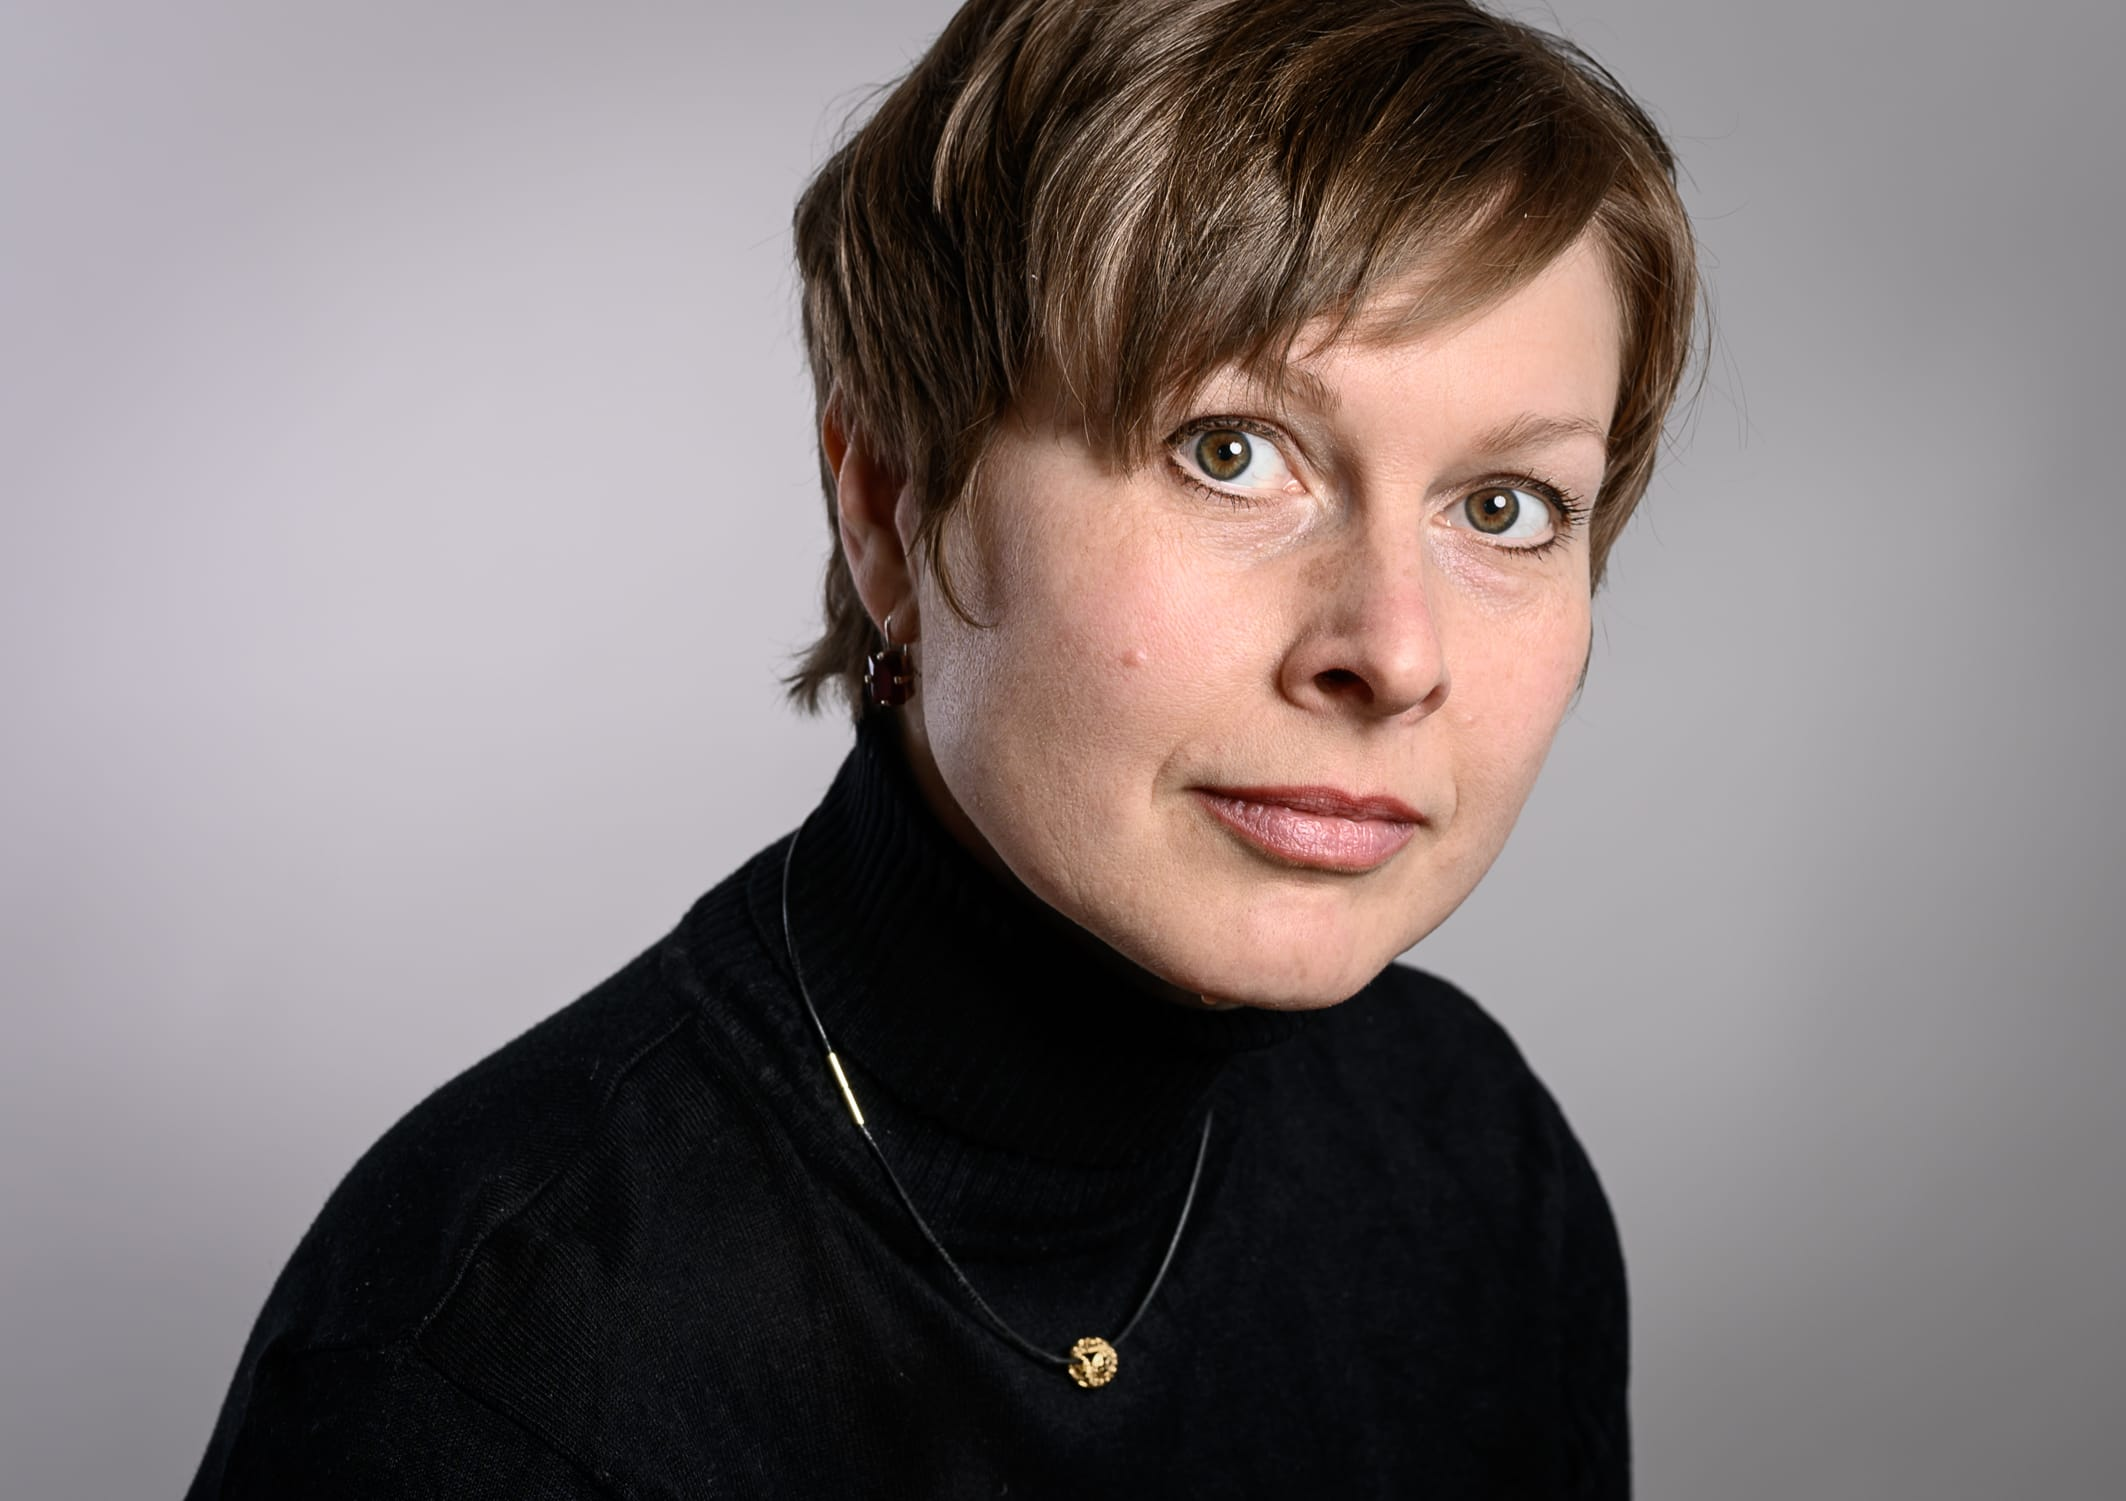 portrait Foto von Grit Kolpatzik